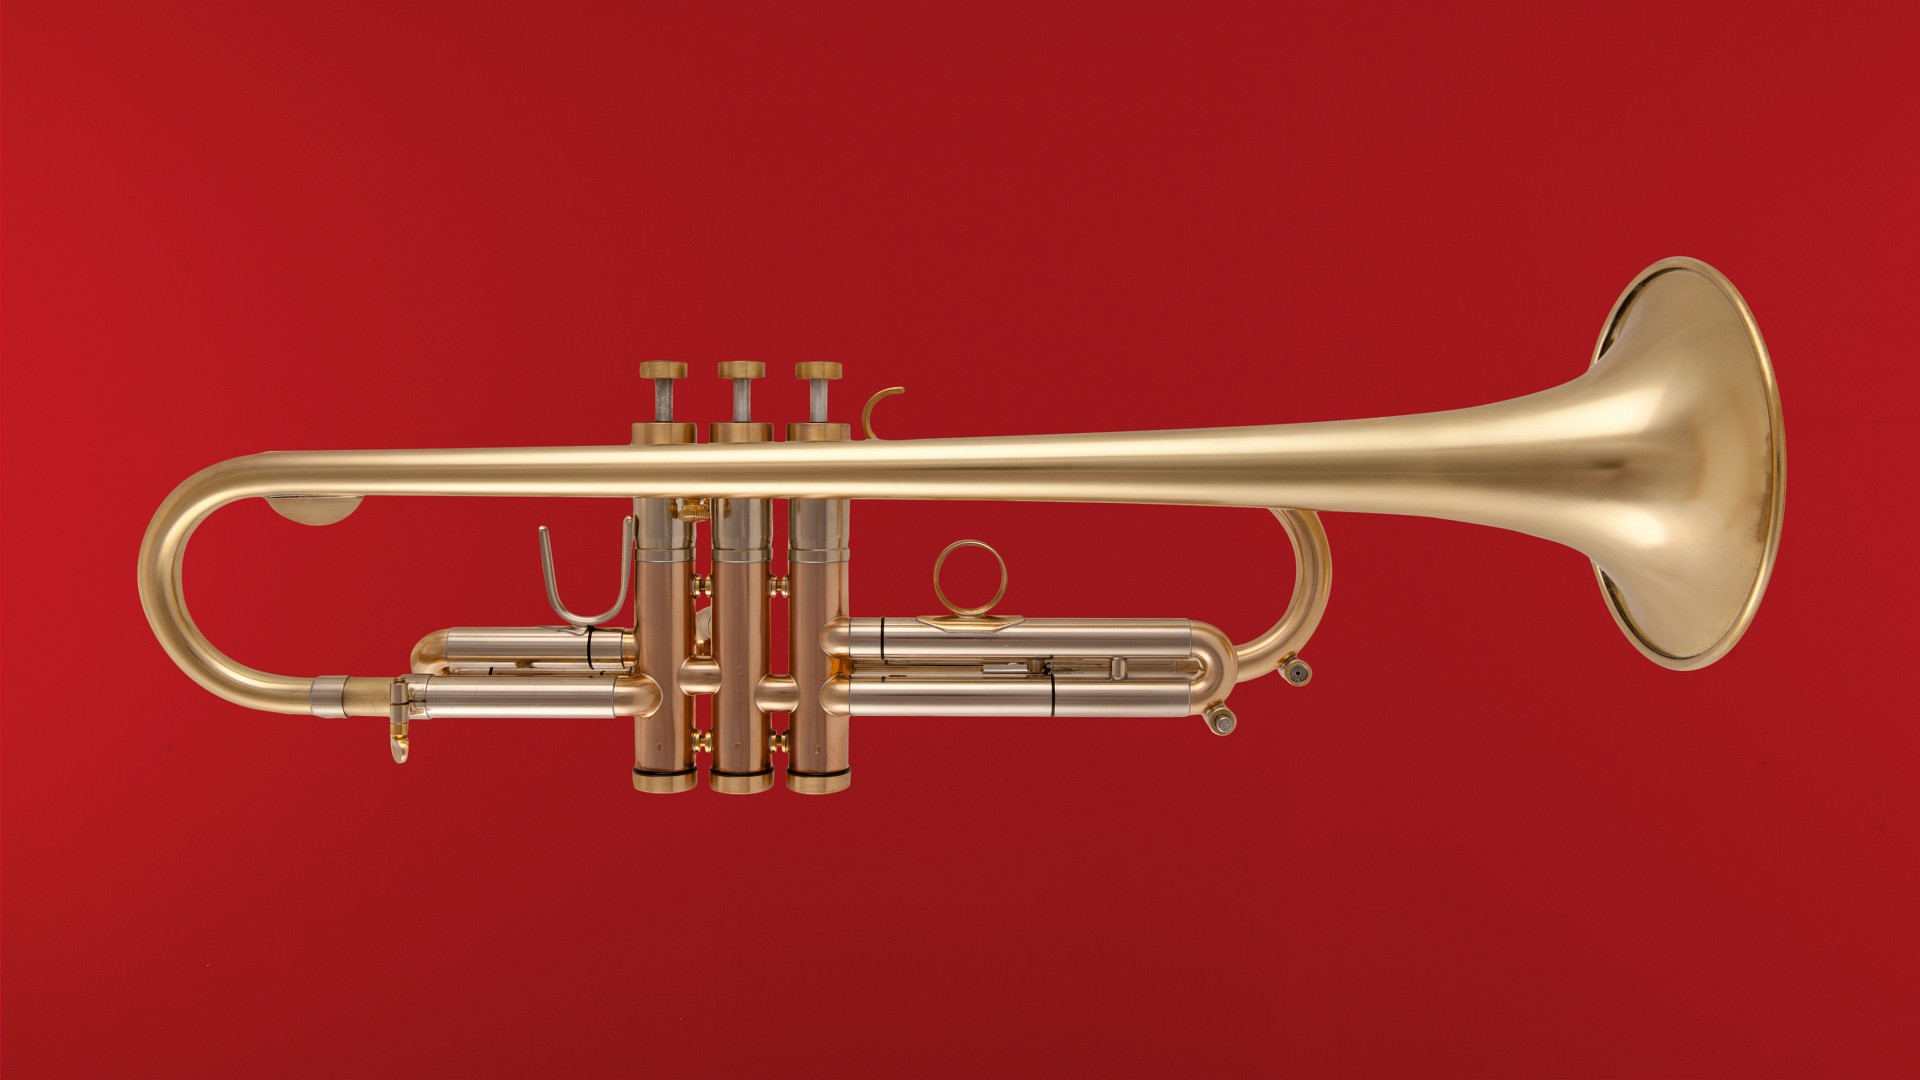 trompete_linkshaender_r_1920x1080px